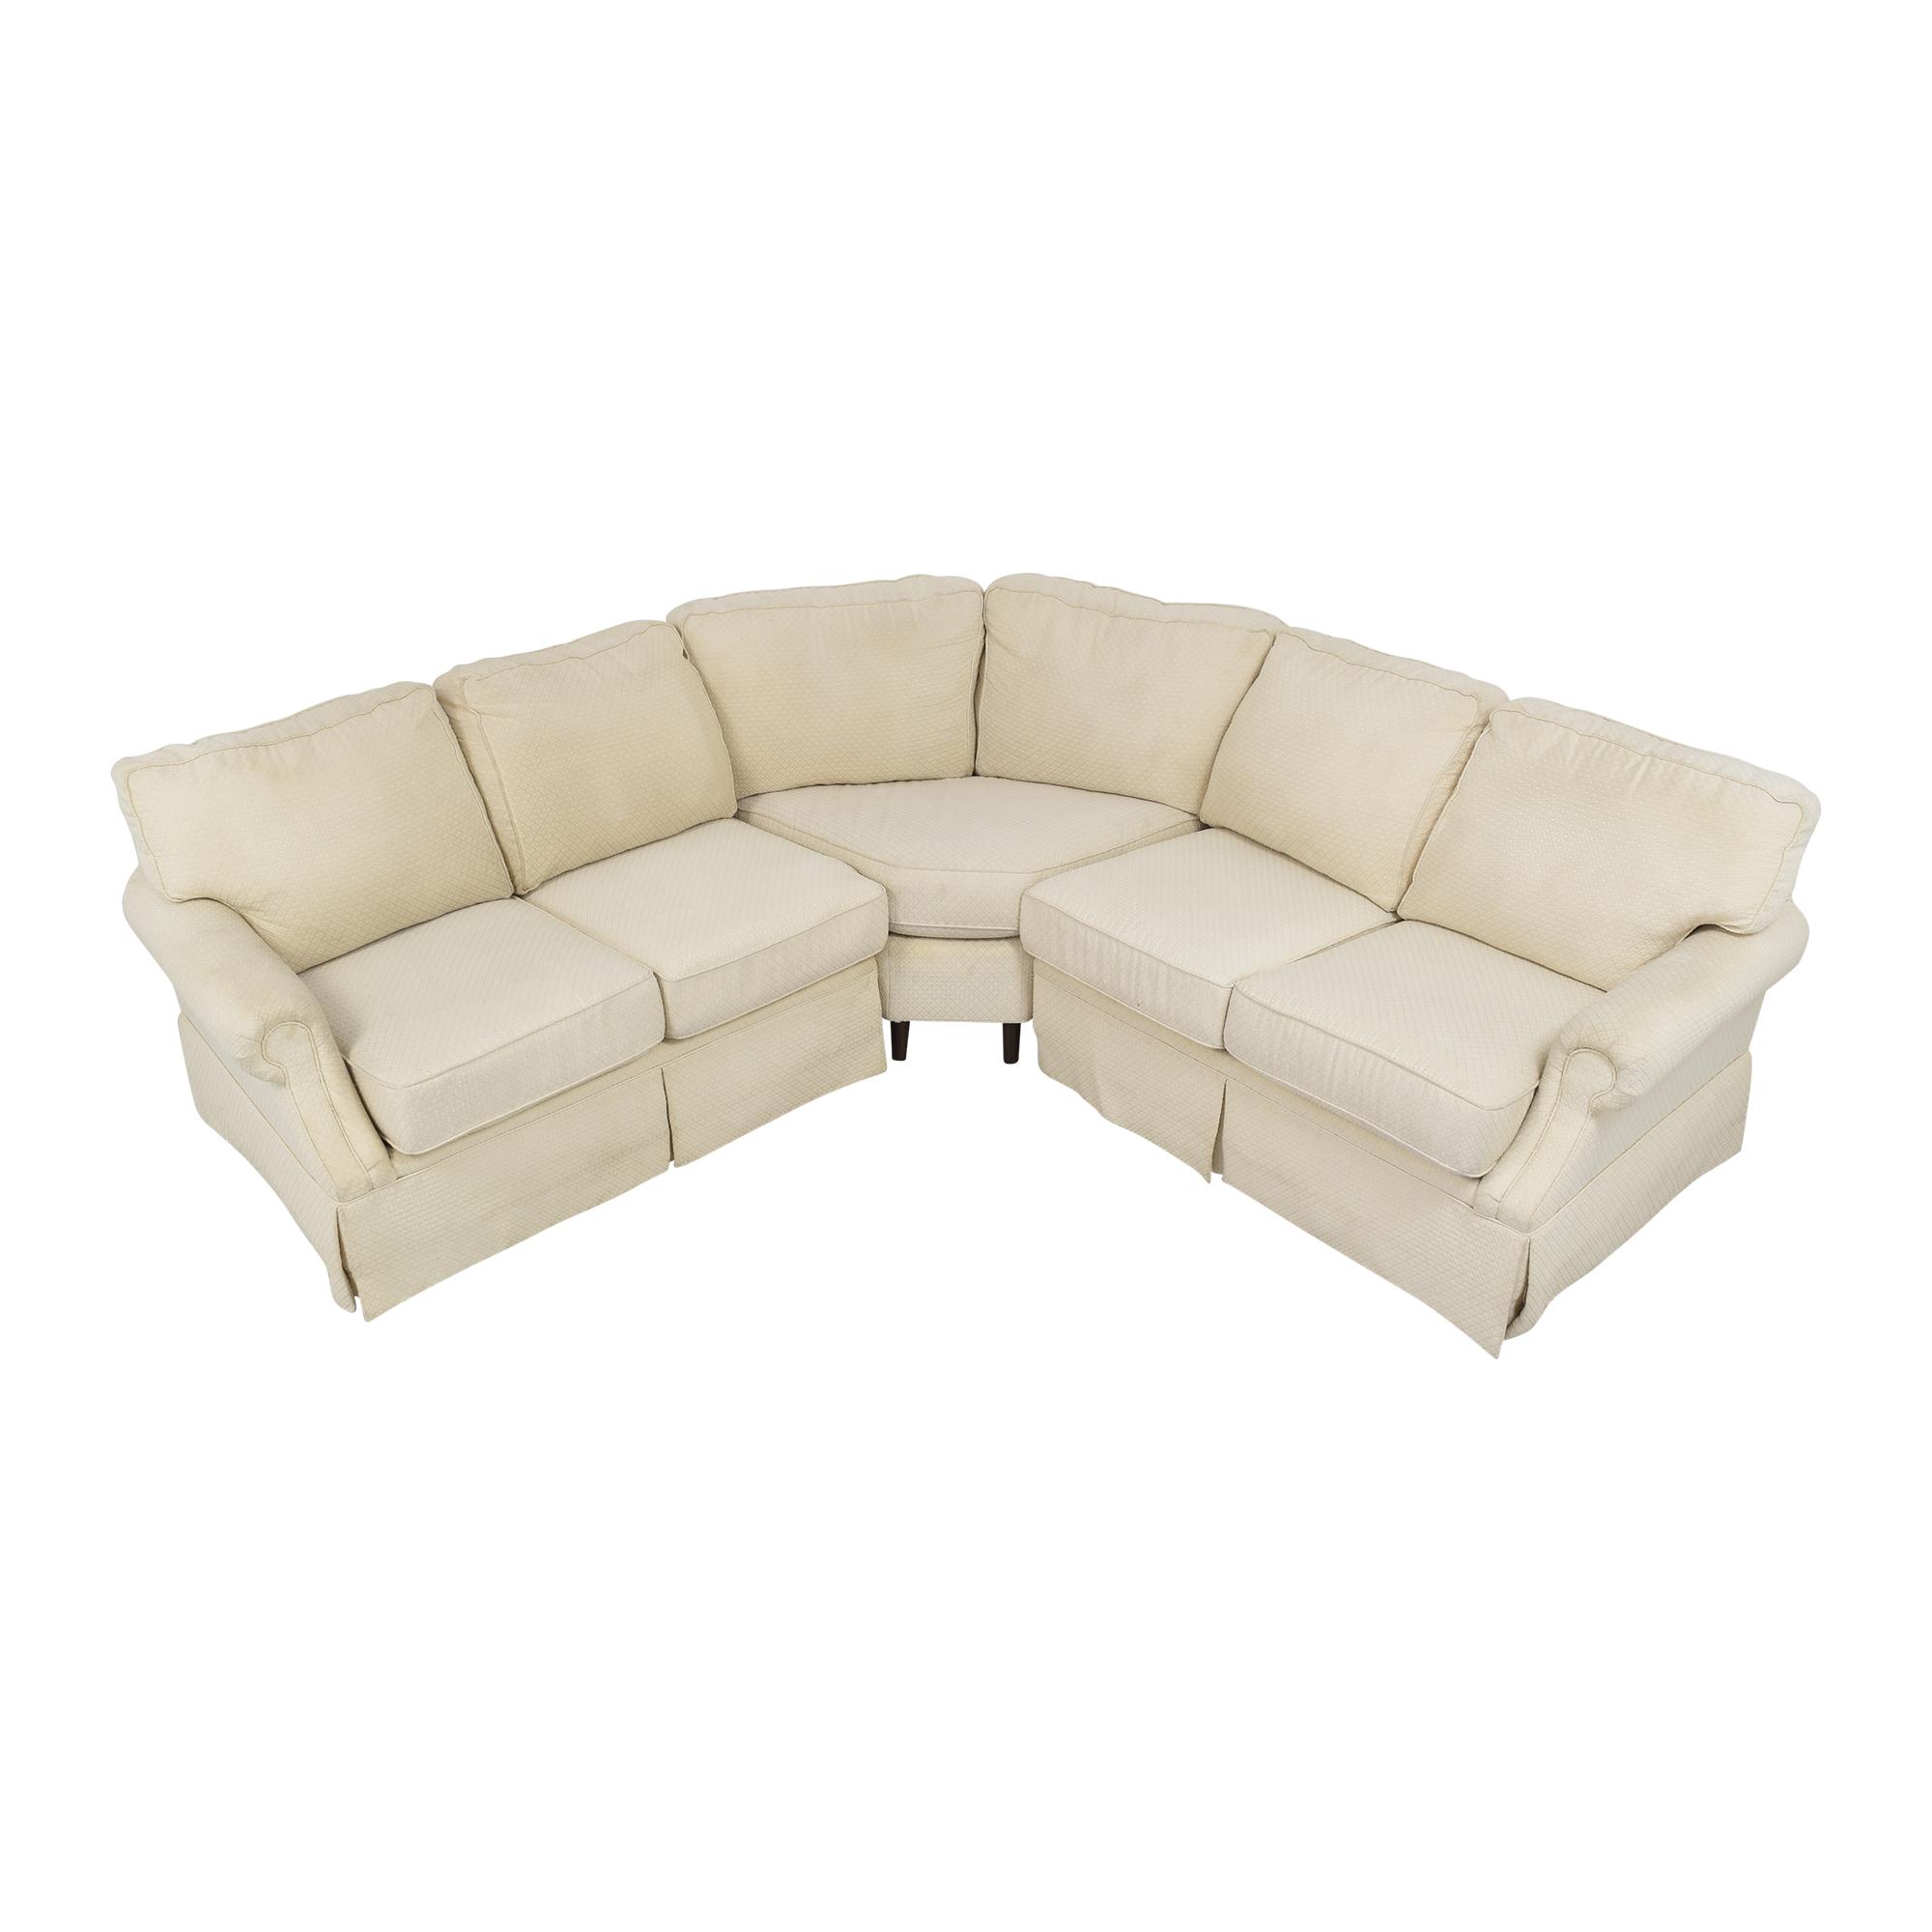 Flexsteel Flexsteel L Shaped Sectional Sofa ct